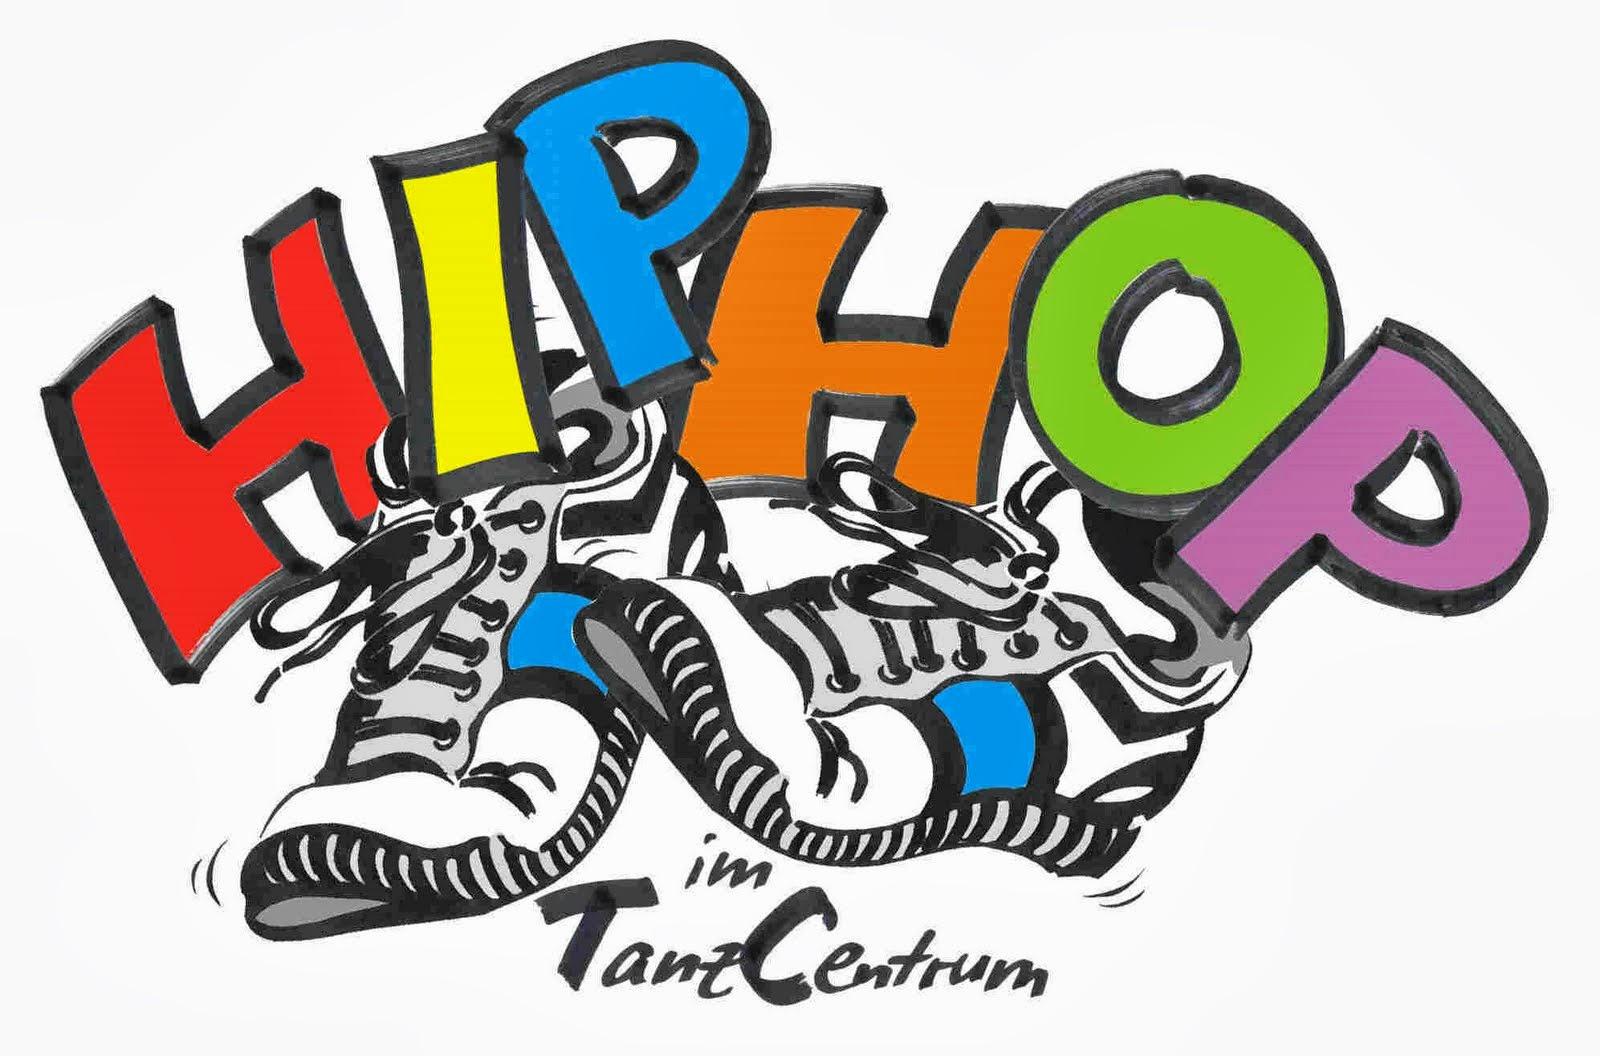 All about logo hip hop logo